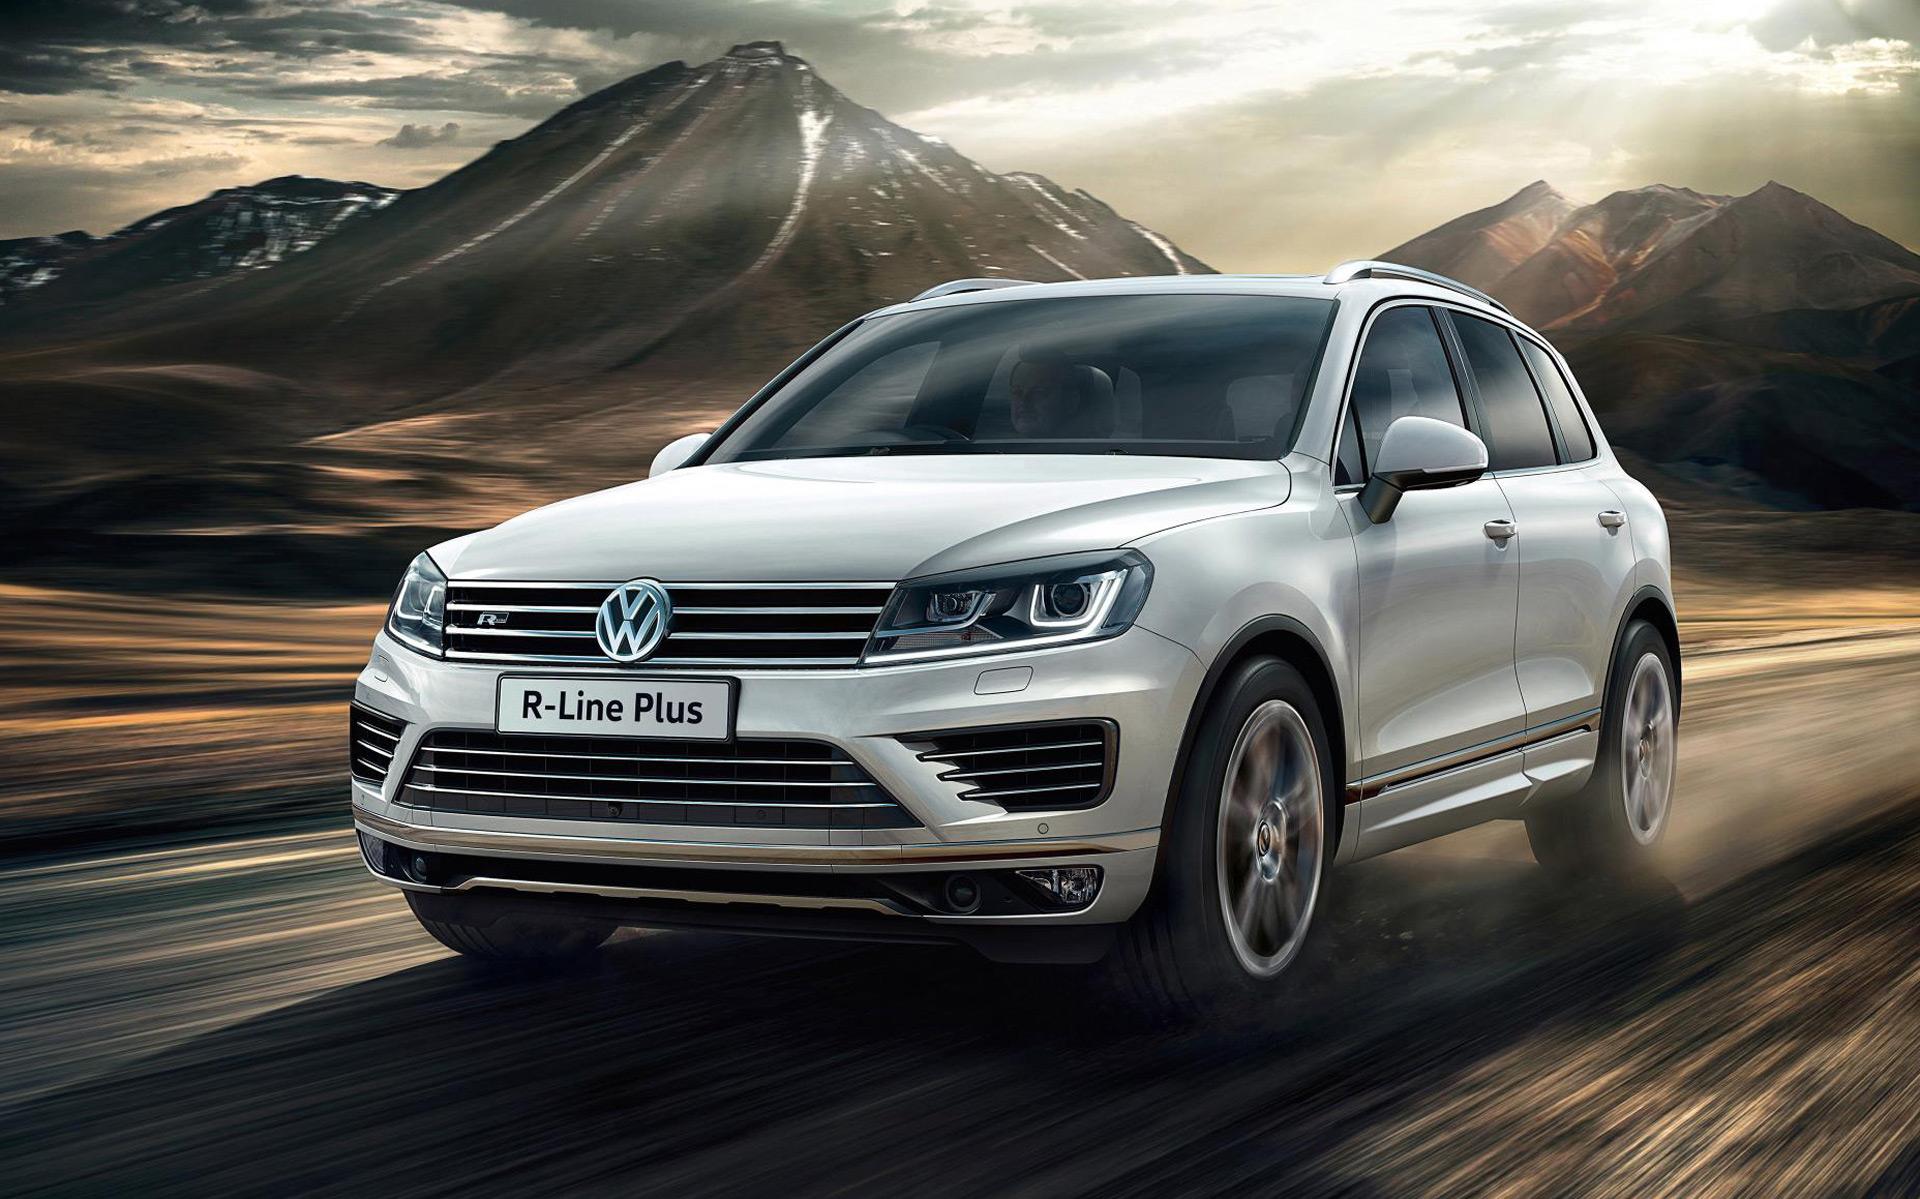 Volkswagen unveils premium R-Line Plus package for Touareg